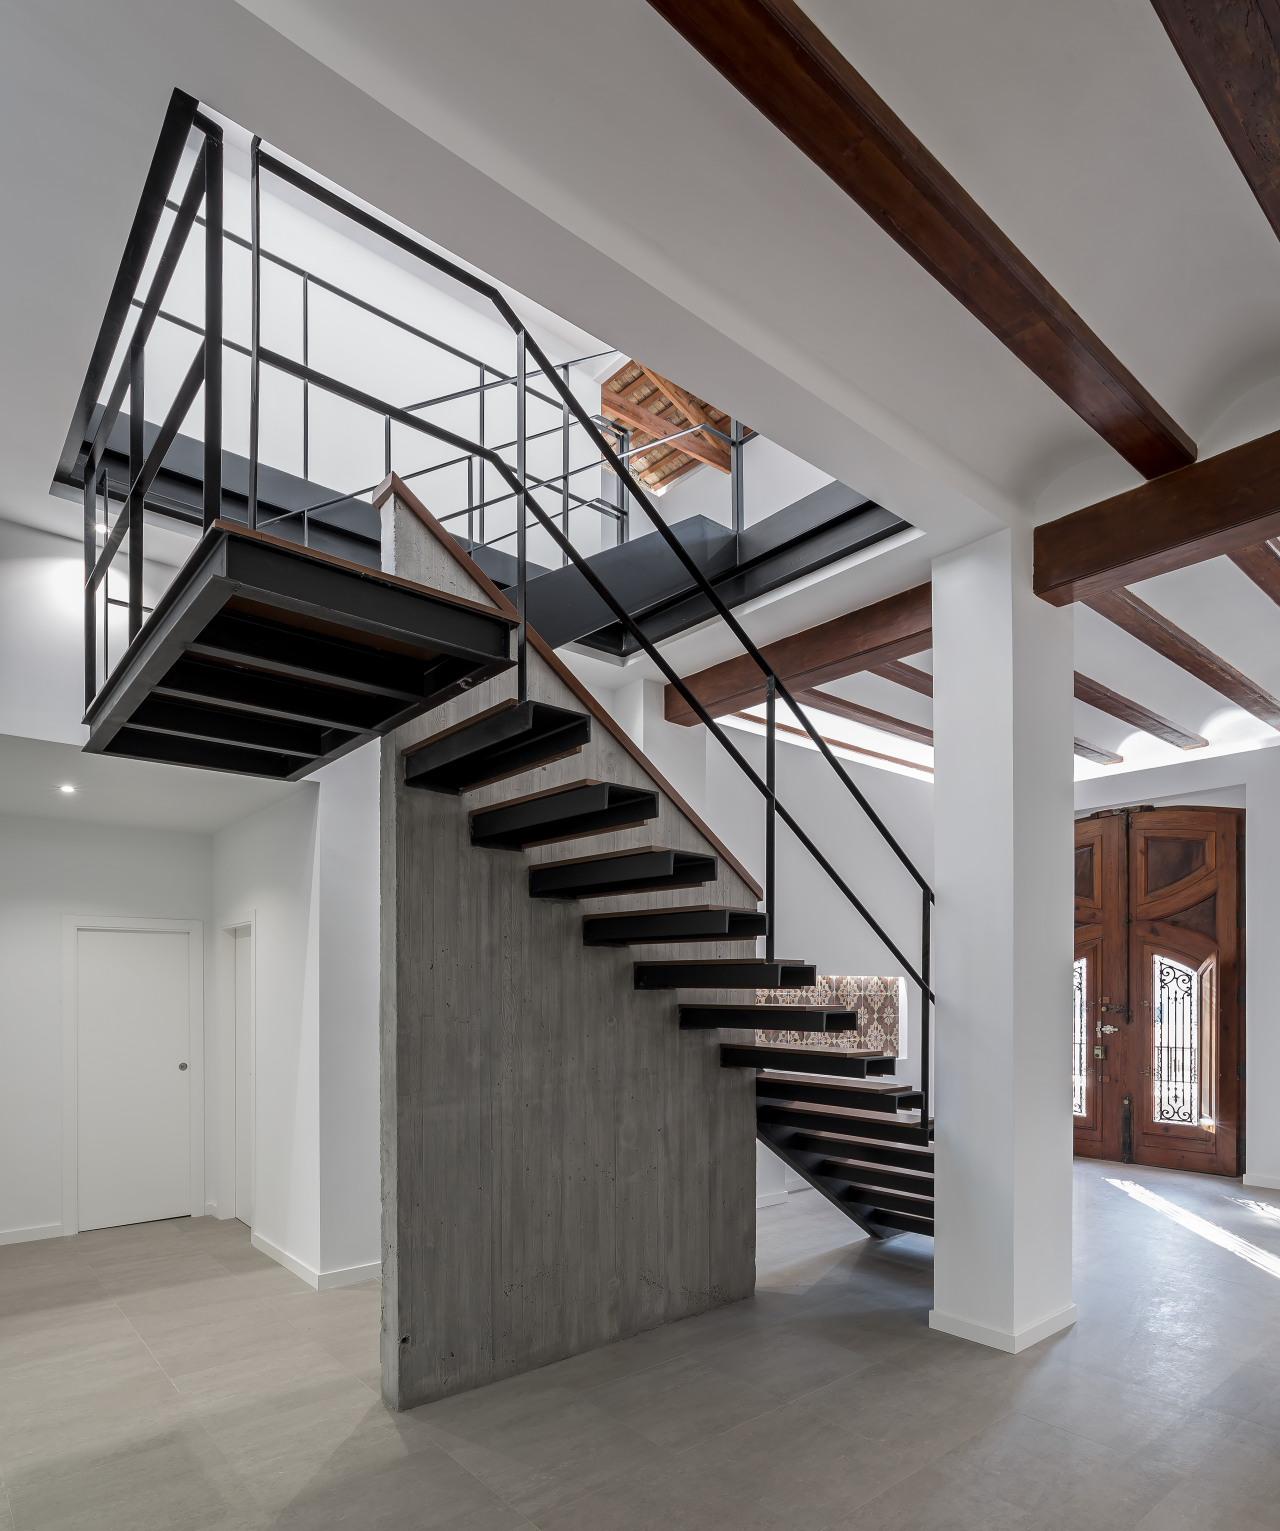 fotografia-arquitectura-valencia-german-cabo-viraje-rehabilitacion-campanar (15)